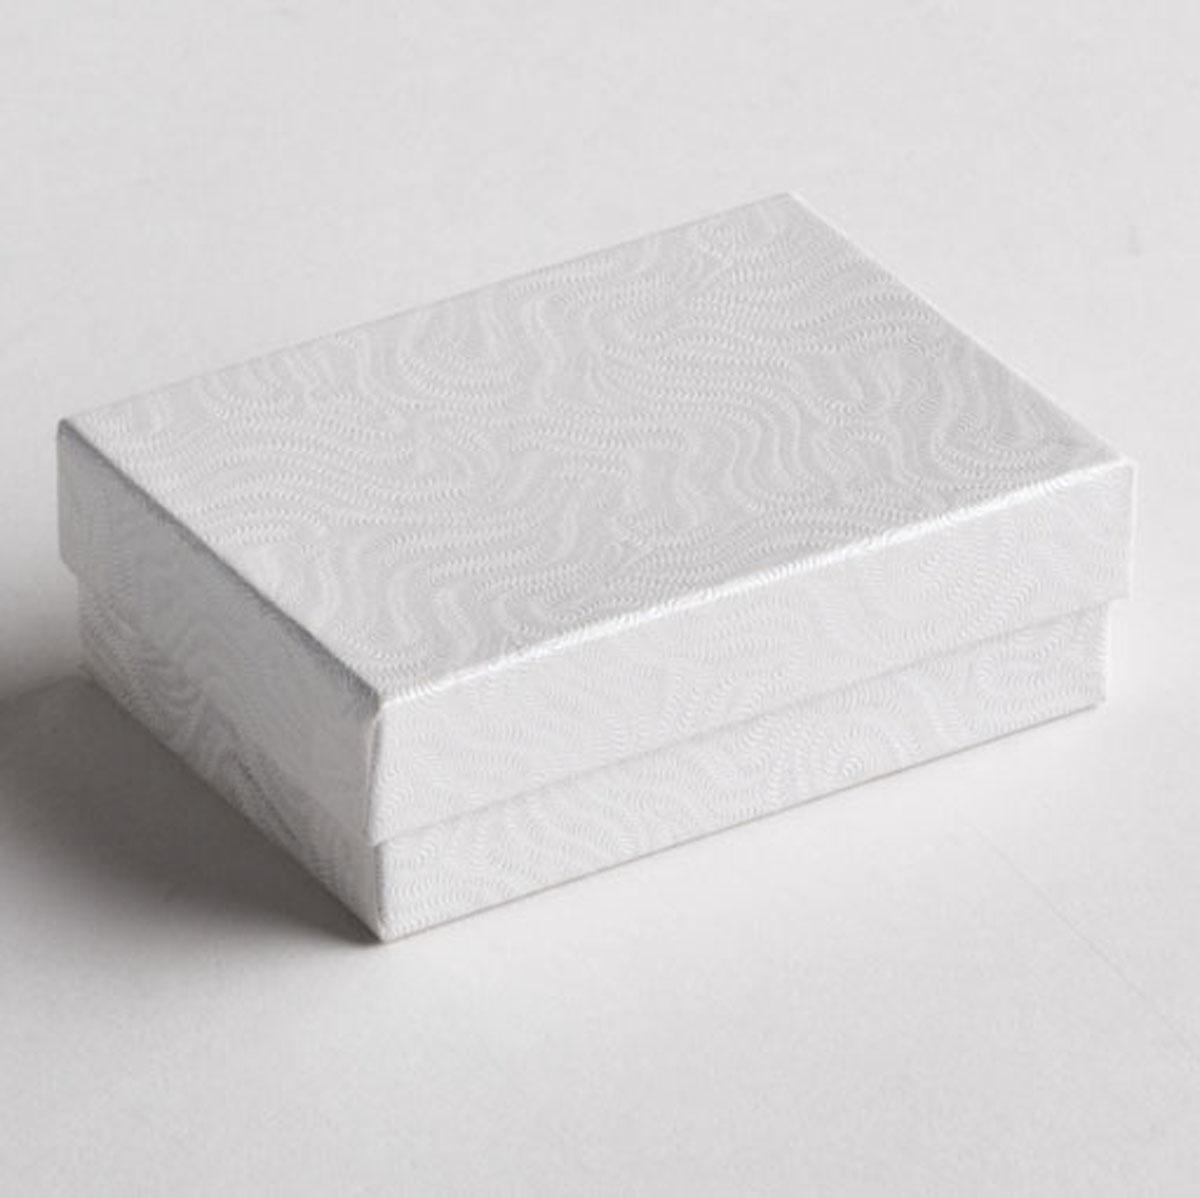 White Swirl Earring Boxes